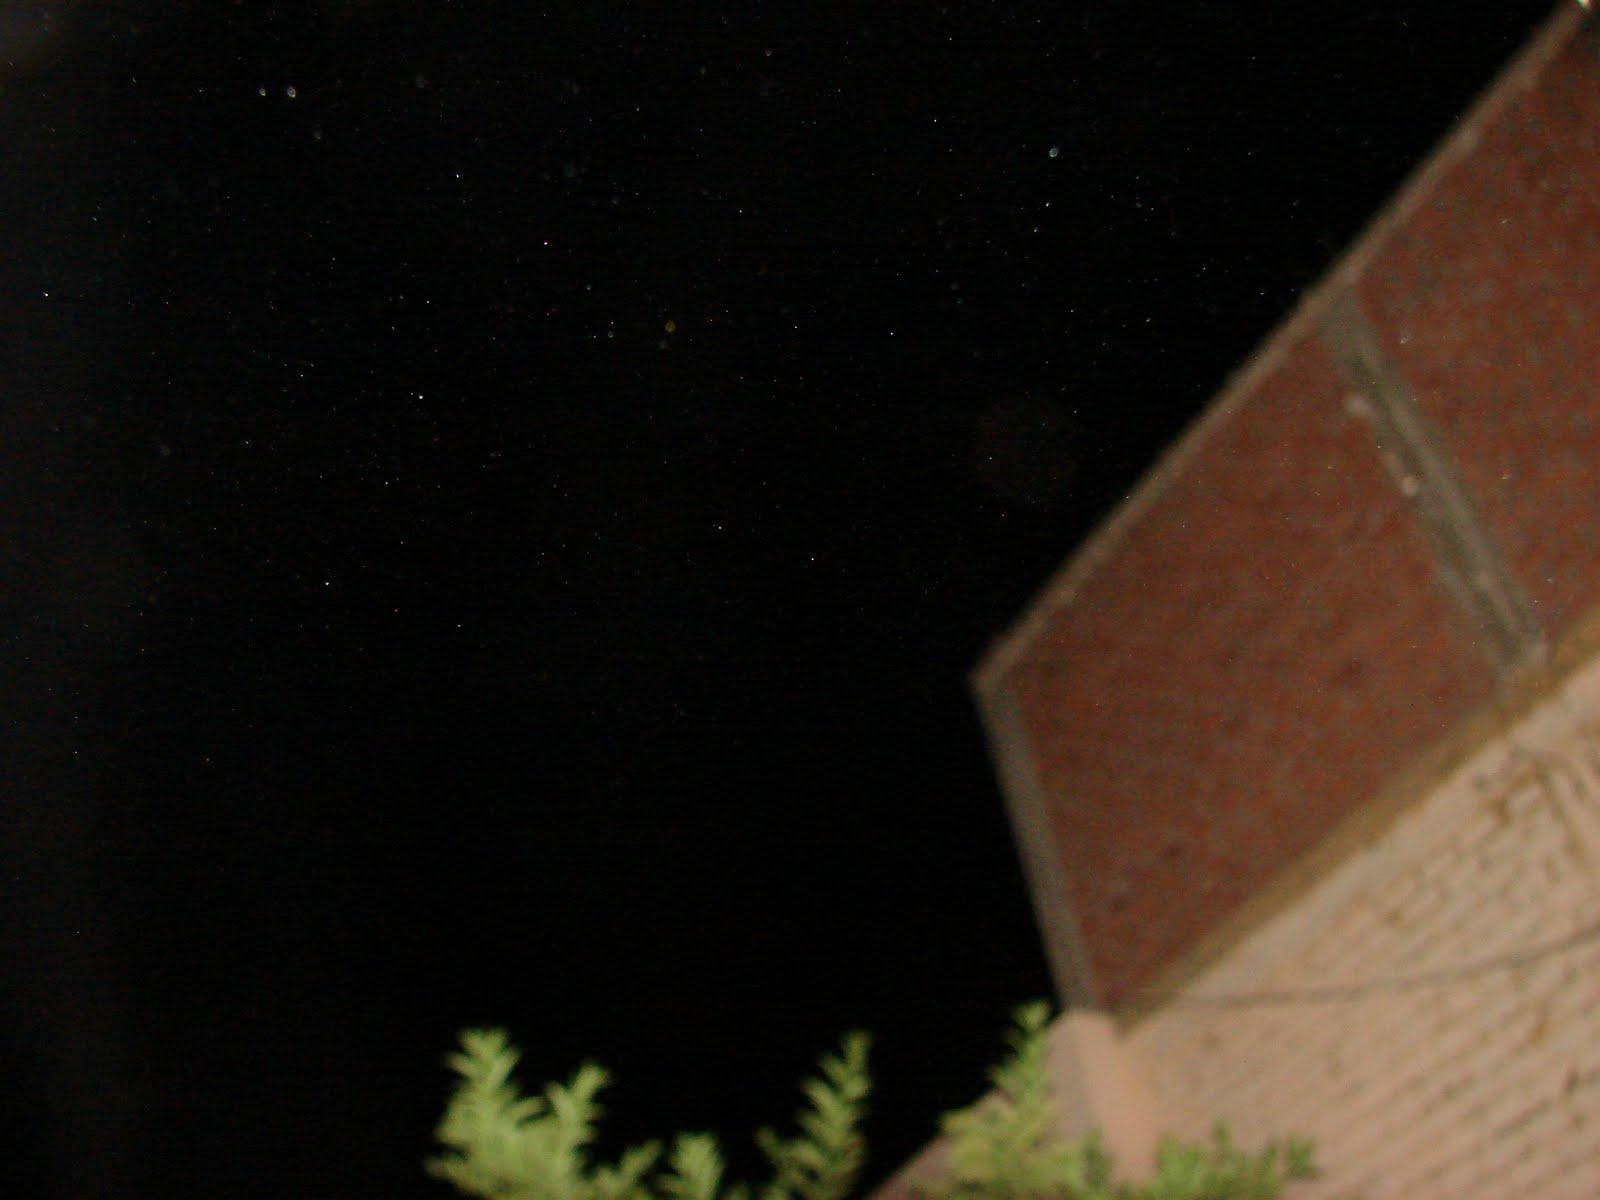 7-febrero-8-9-10...2011..Lunes .avistamientos Ovni Cielo fulll  2:15 am sec